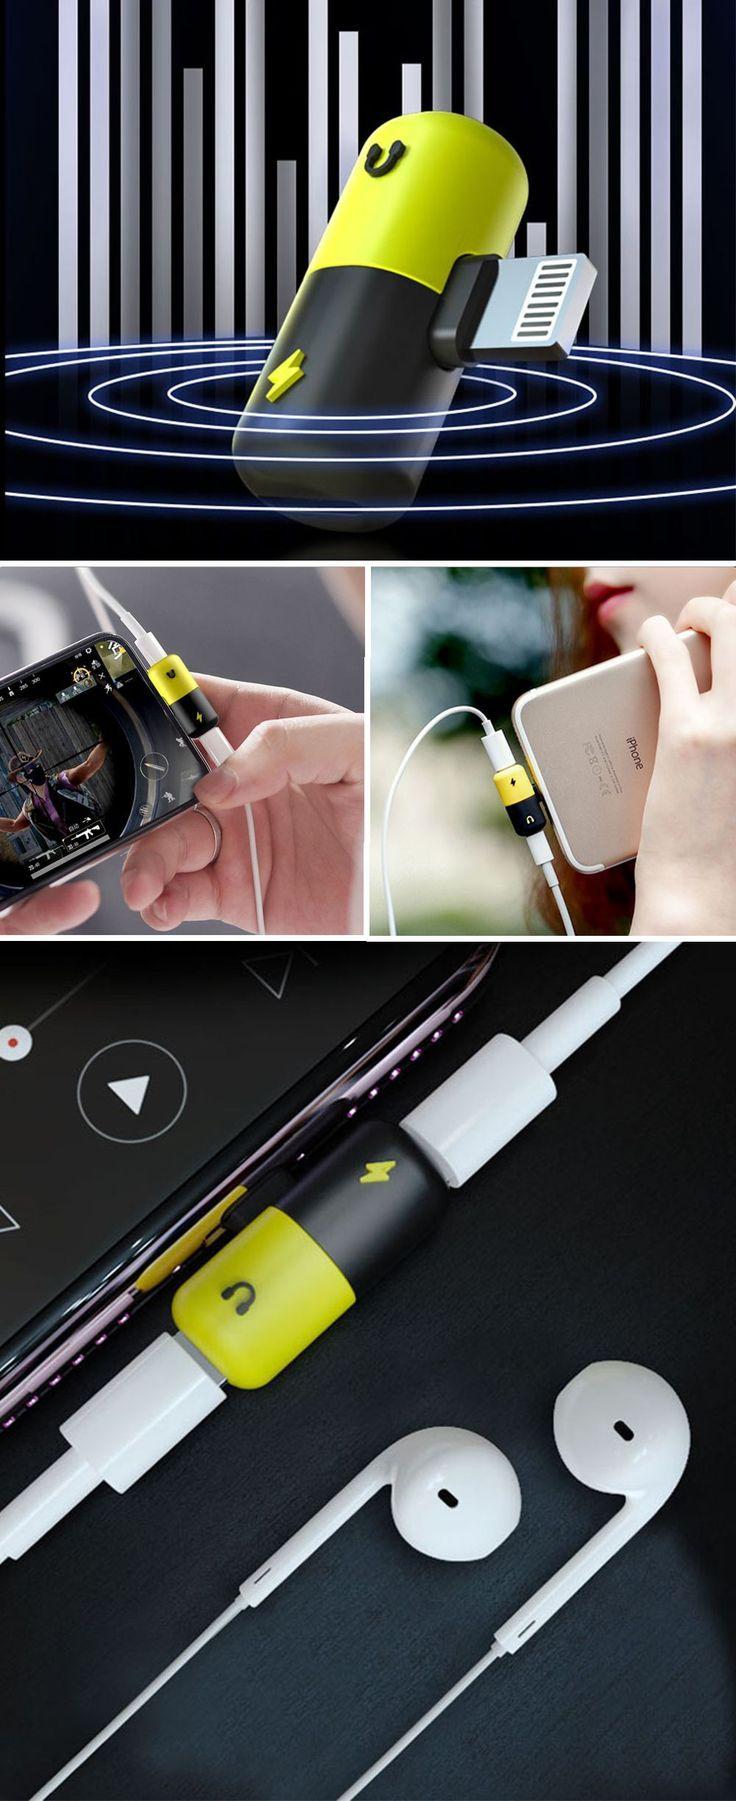 smartphone mobileaccessories iphoneaccessories iphone adapter